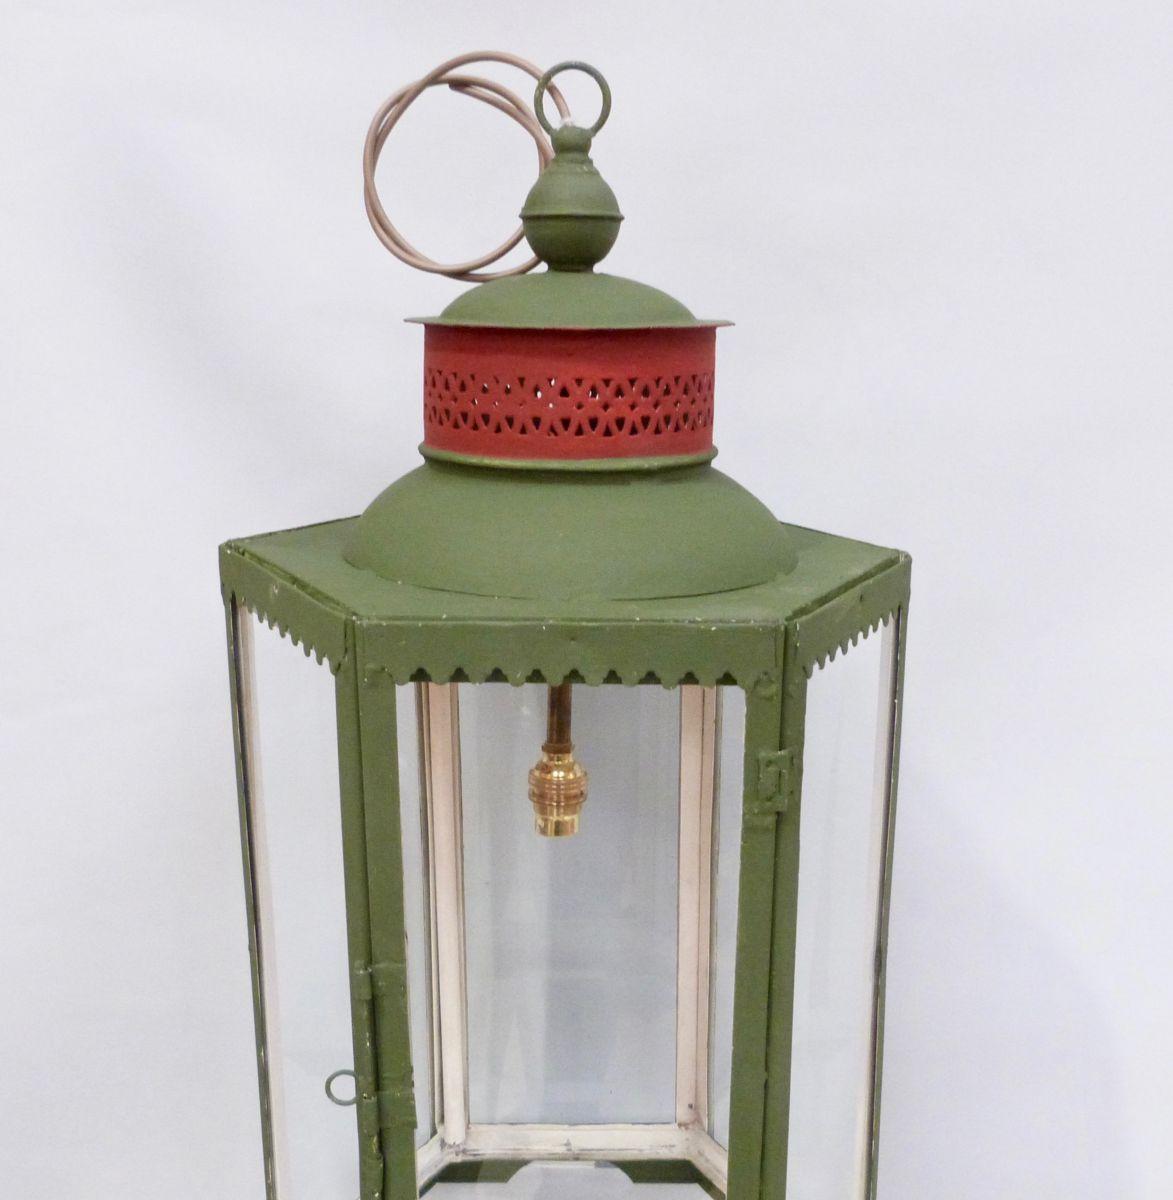 An Hexagonal Green Lantern With Red Collar Stock